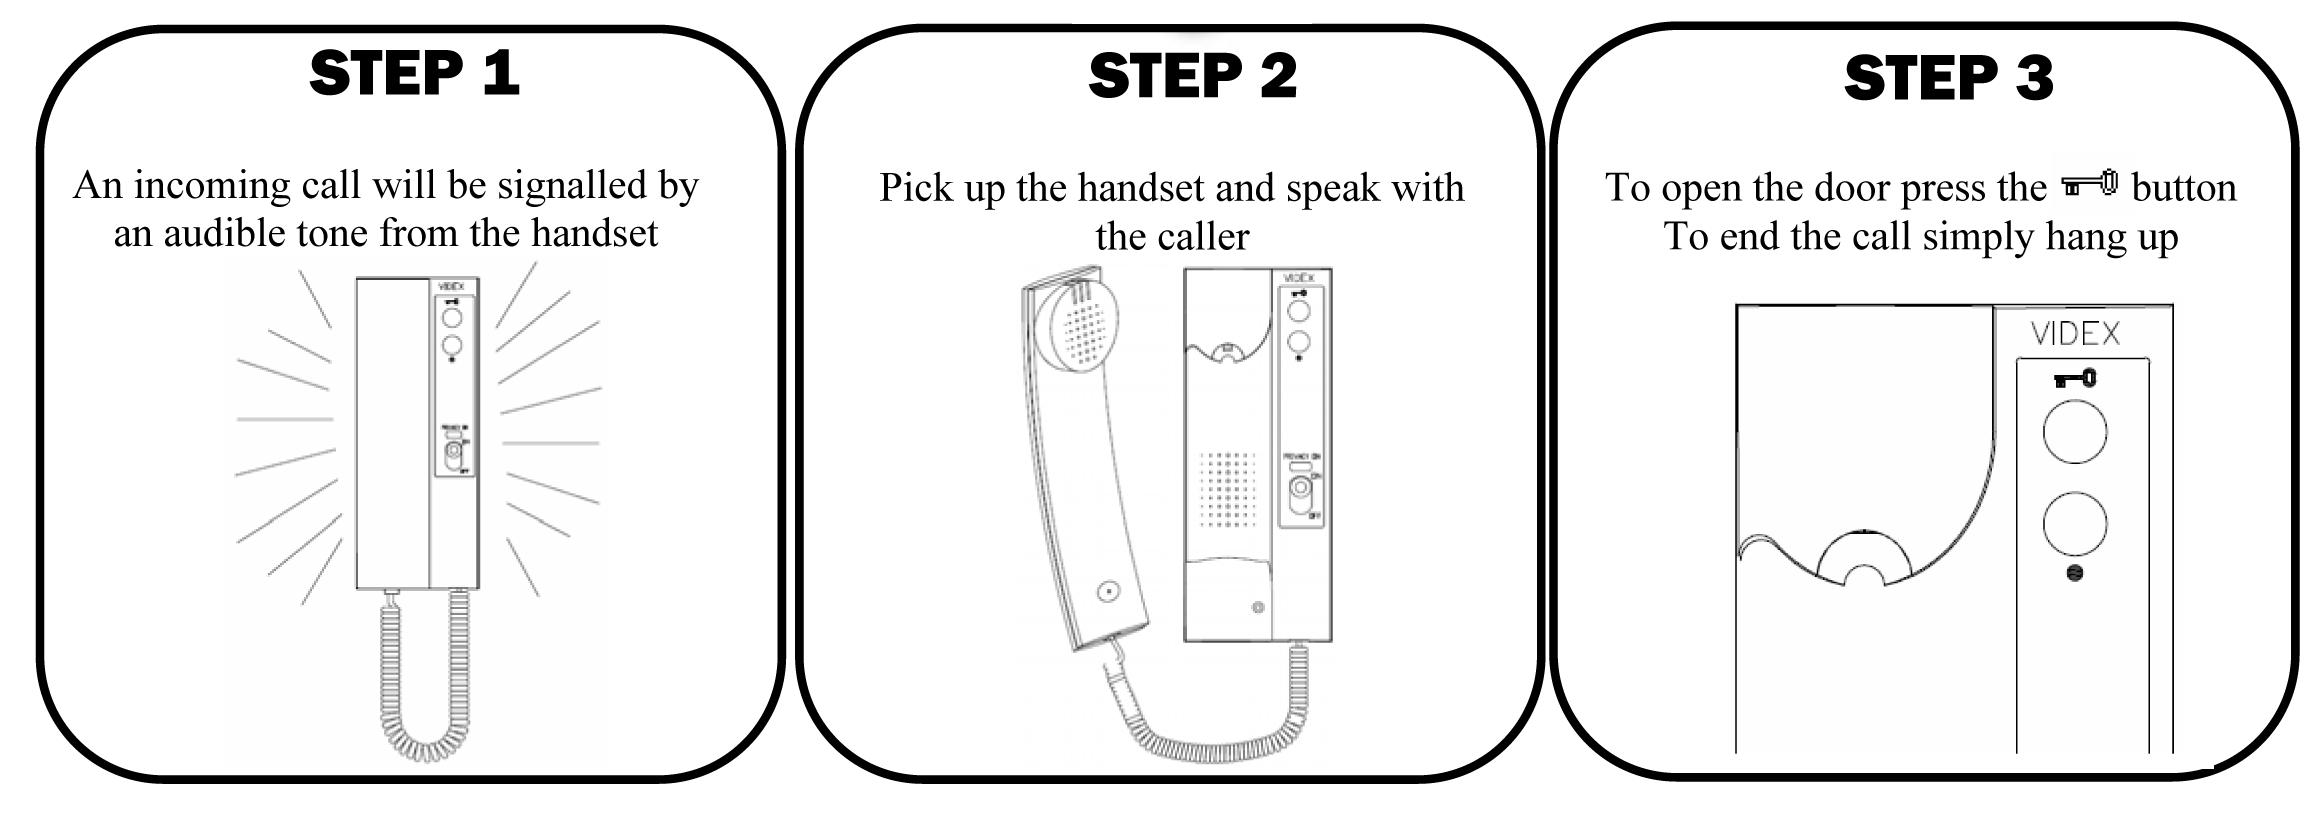 Videx 3102 Intercom Access Control Handset Telephone Wiring Diagram